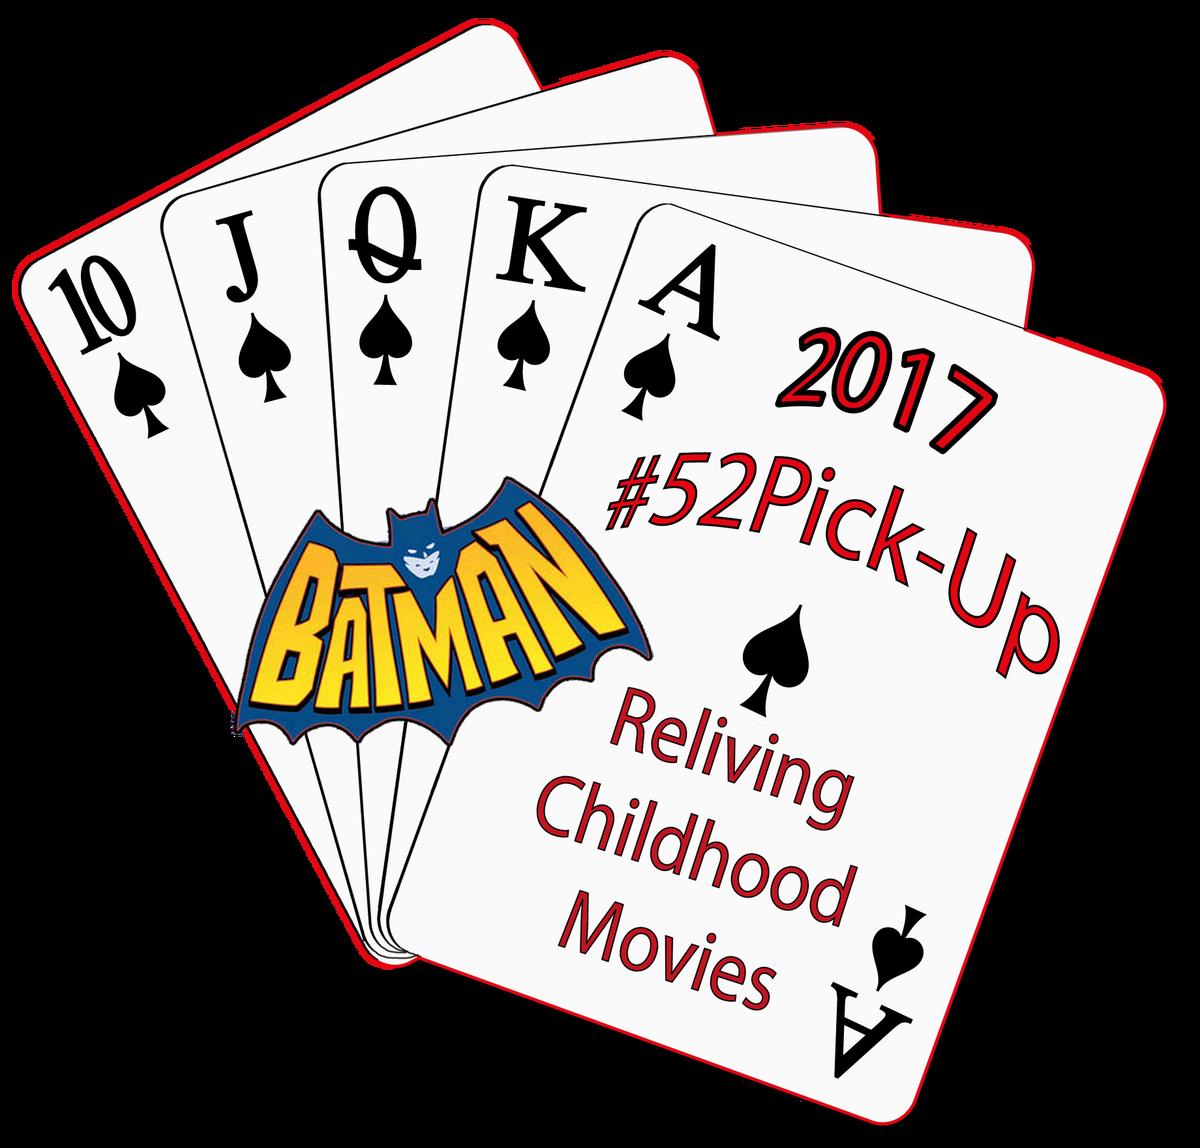 batman the pickup. Film clipart movie matinee